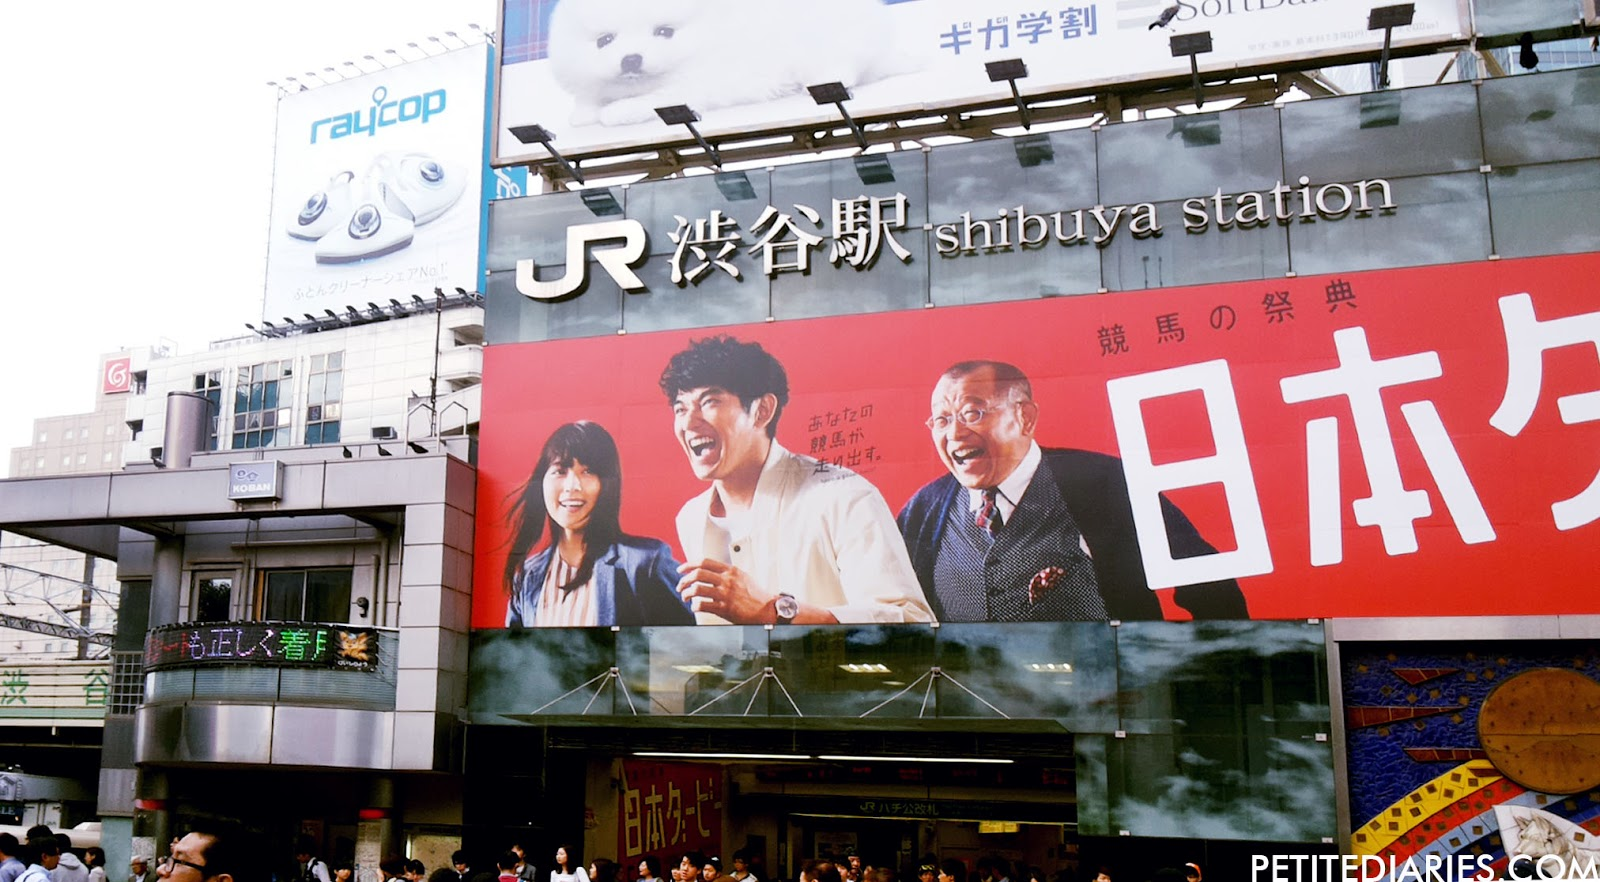 JR SHIBUYA STATION HACHIKO EXIT